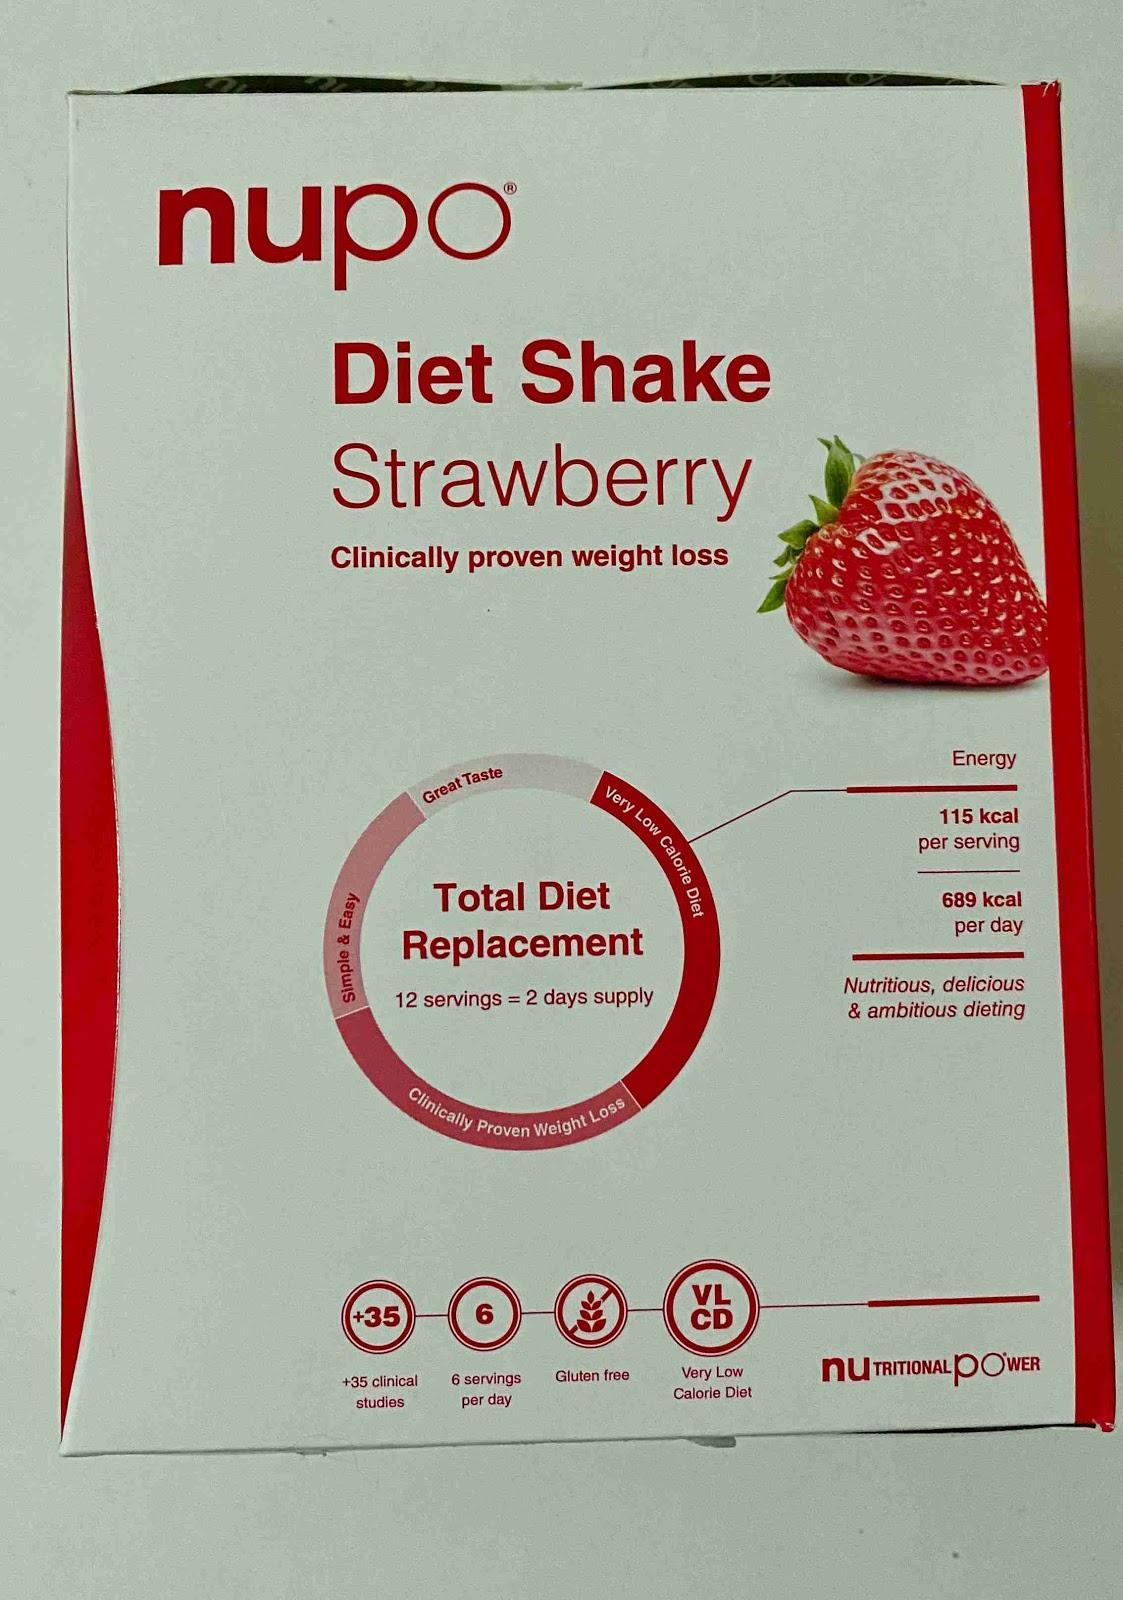 Recenze Vivantis: Dieta NUPO - shake s příchutí jahoda